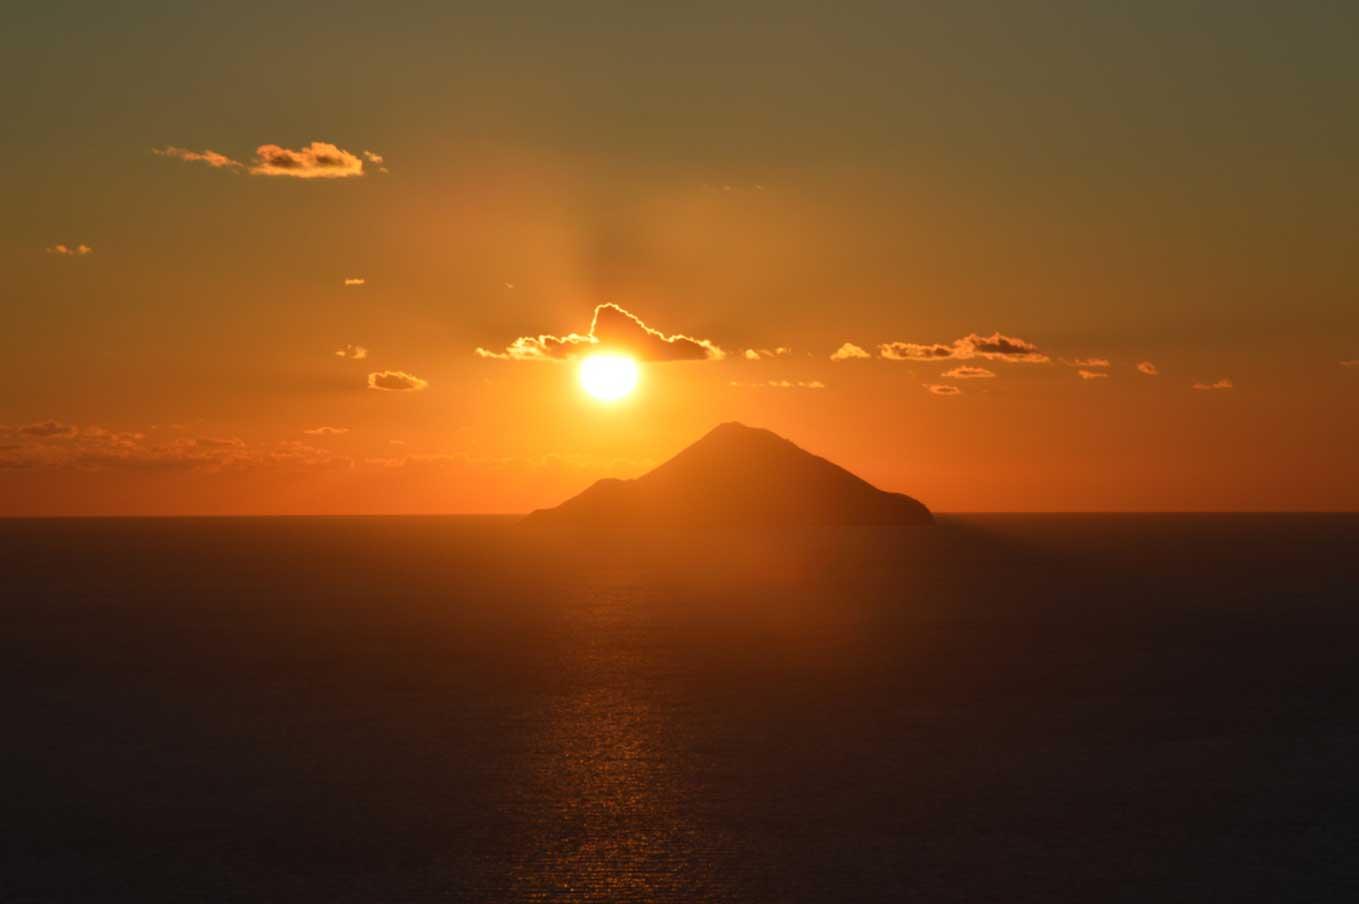 Seaside panorama of Lipari. Largest island of the Aeolian Islands archipelago.